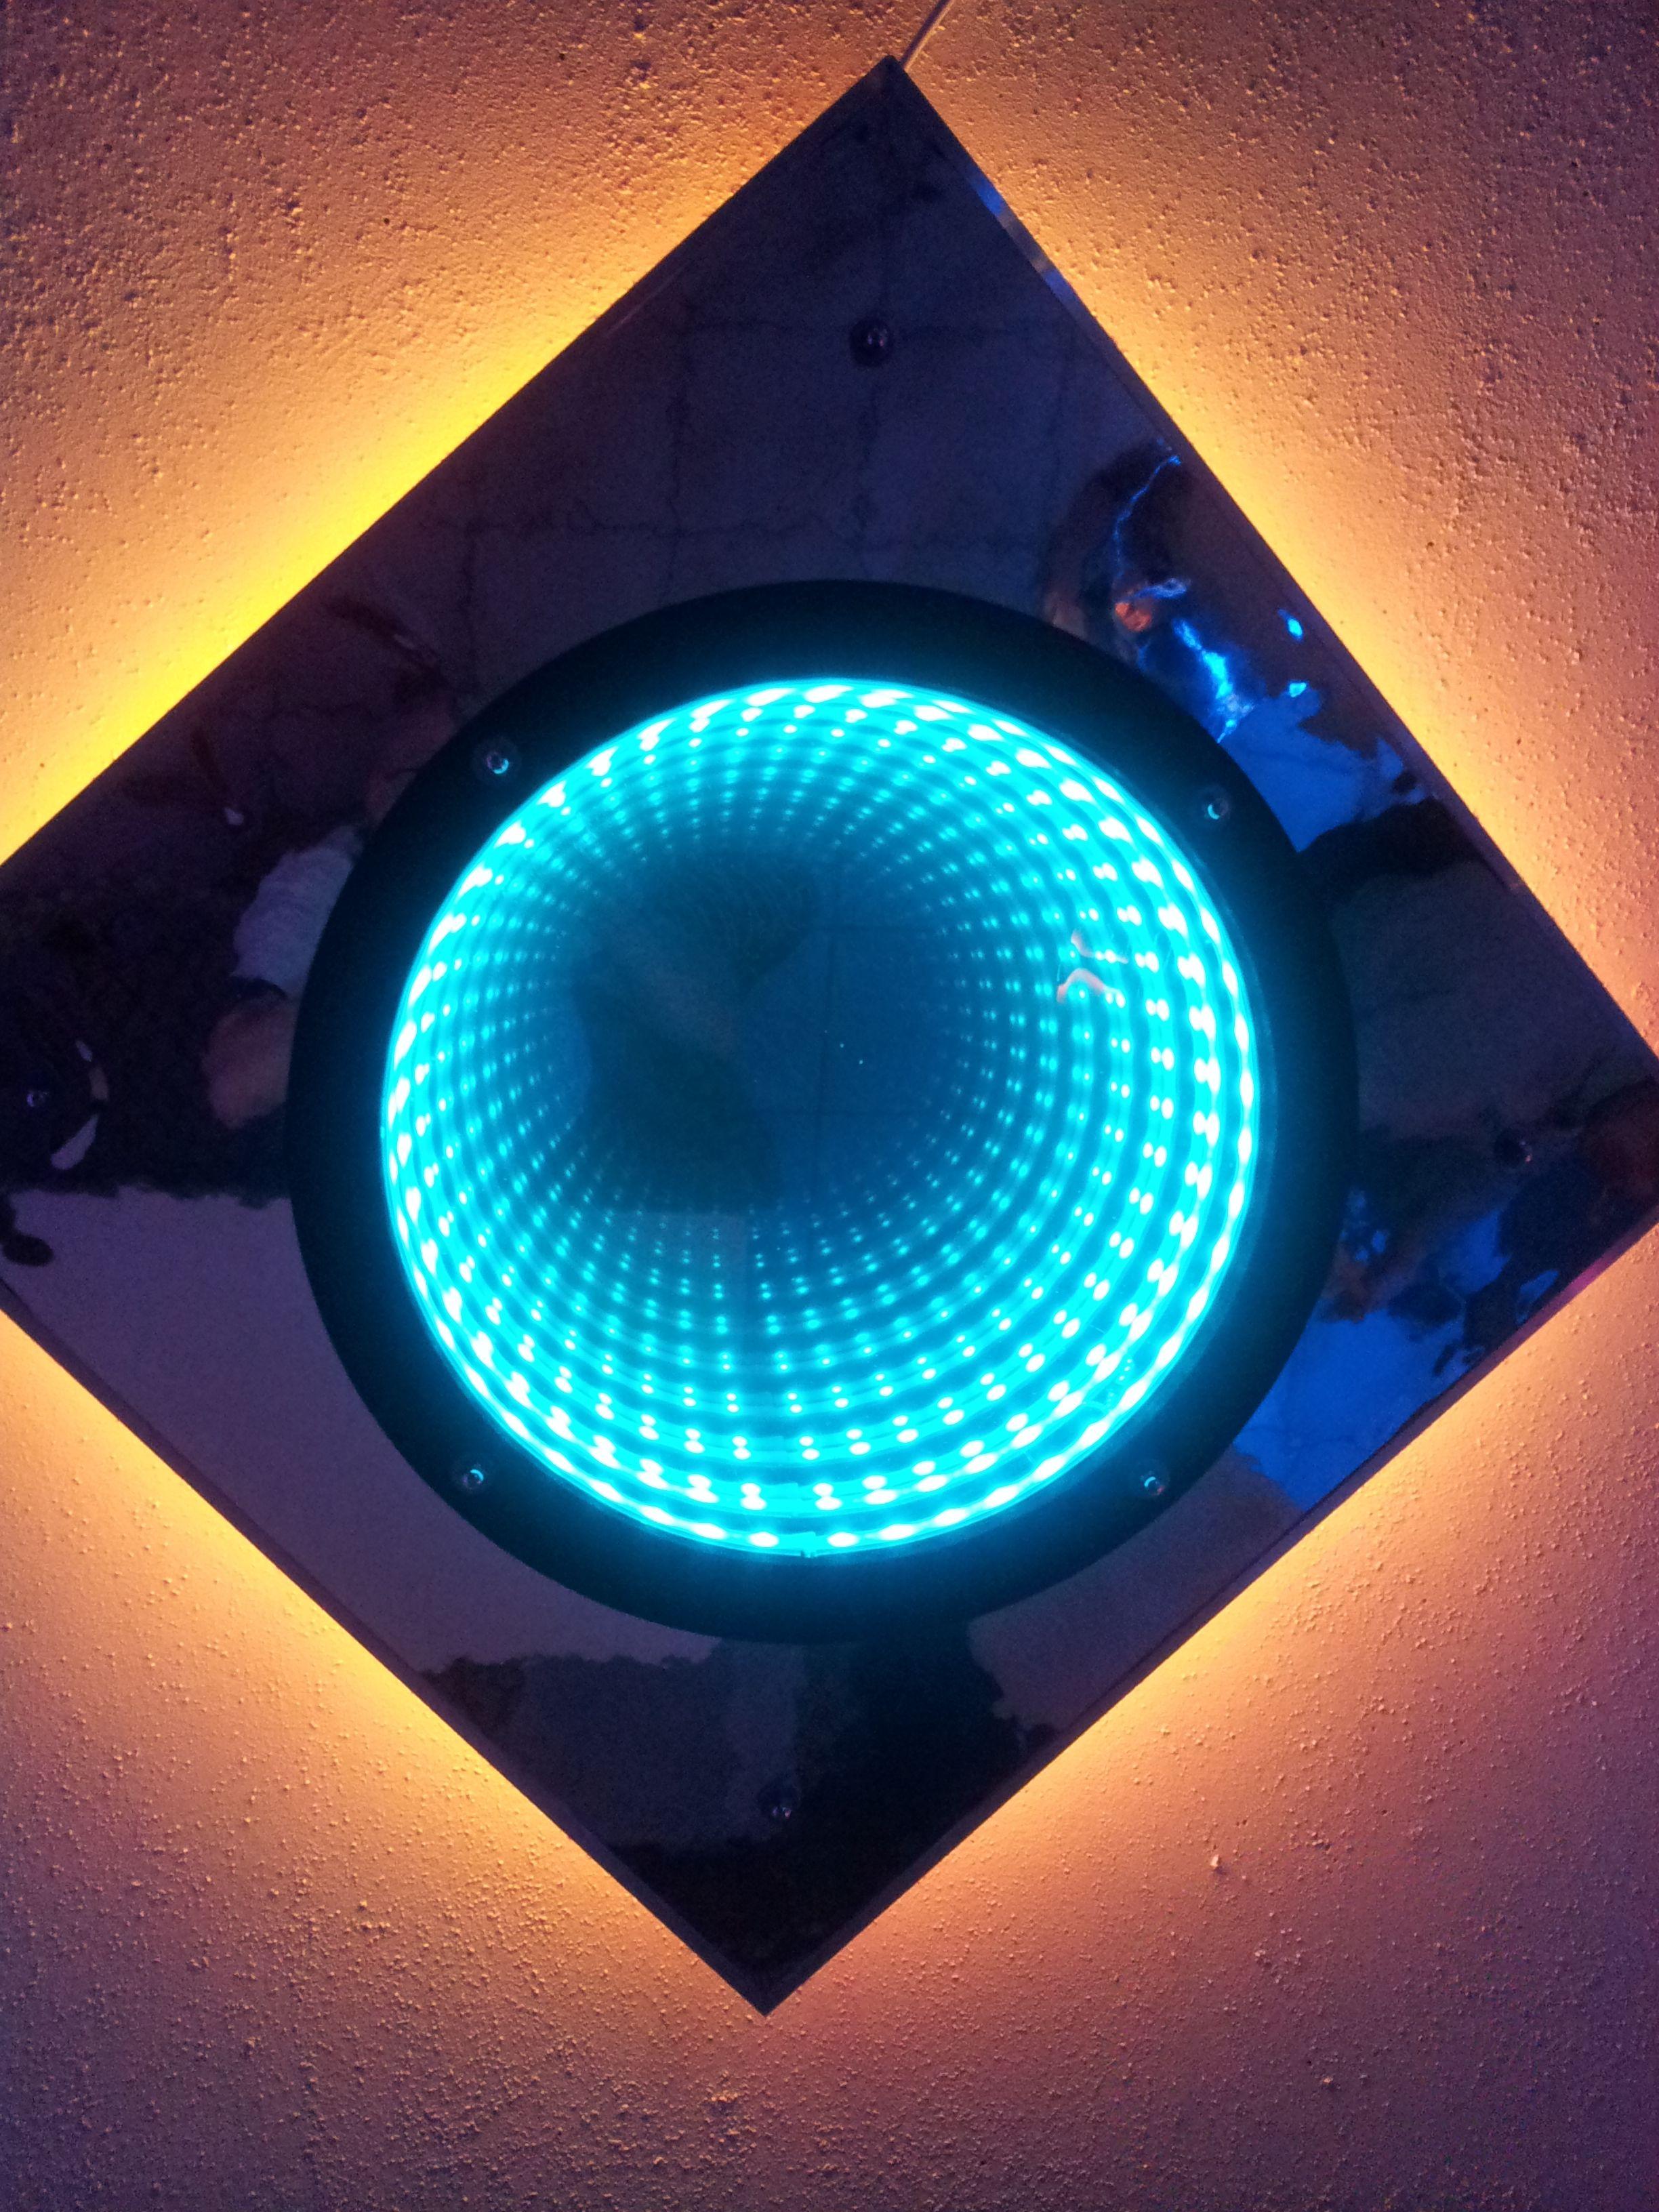 Infinity Mirror Deckenbeleuchtung Https Www Djpeter Co Za Deckenbeleuchtung Beleuchtung